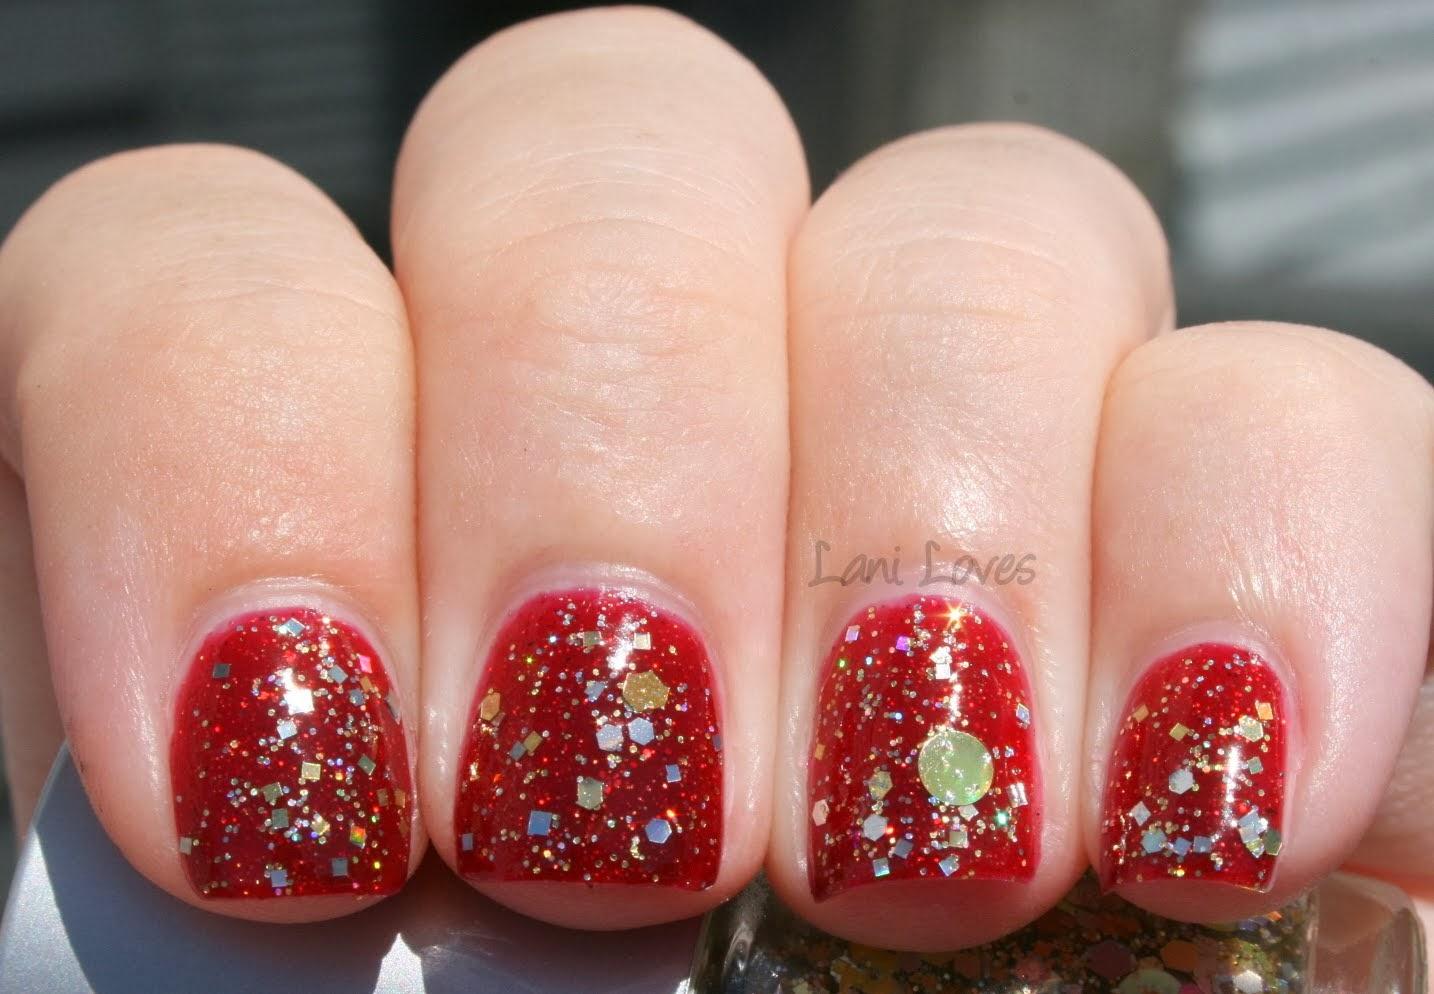 Star Kin Glitters Swatch